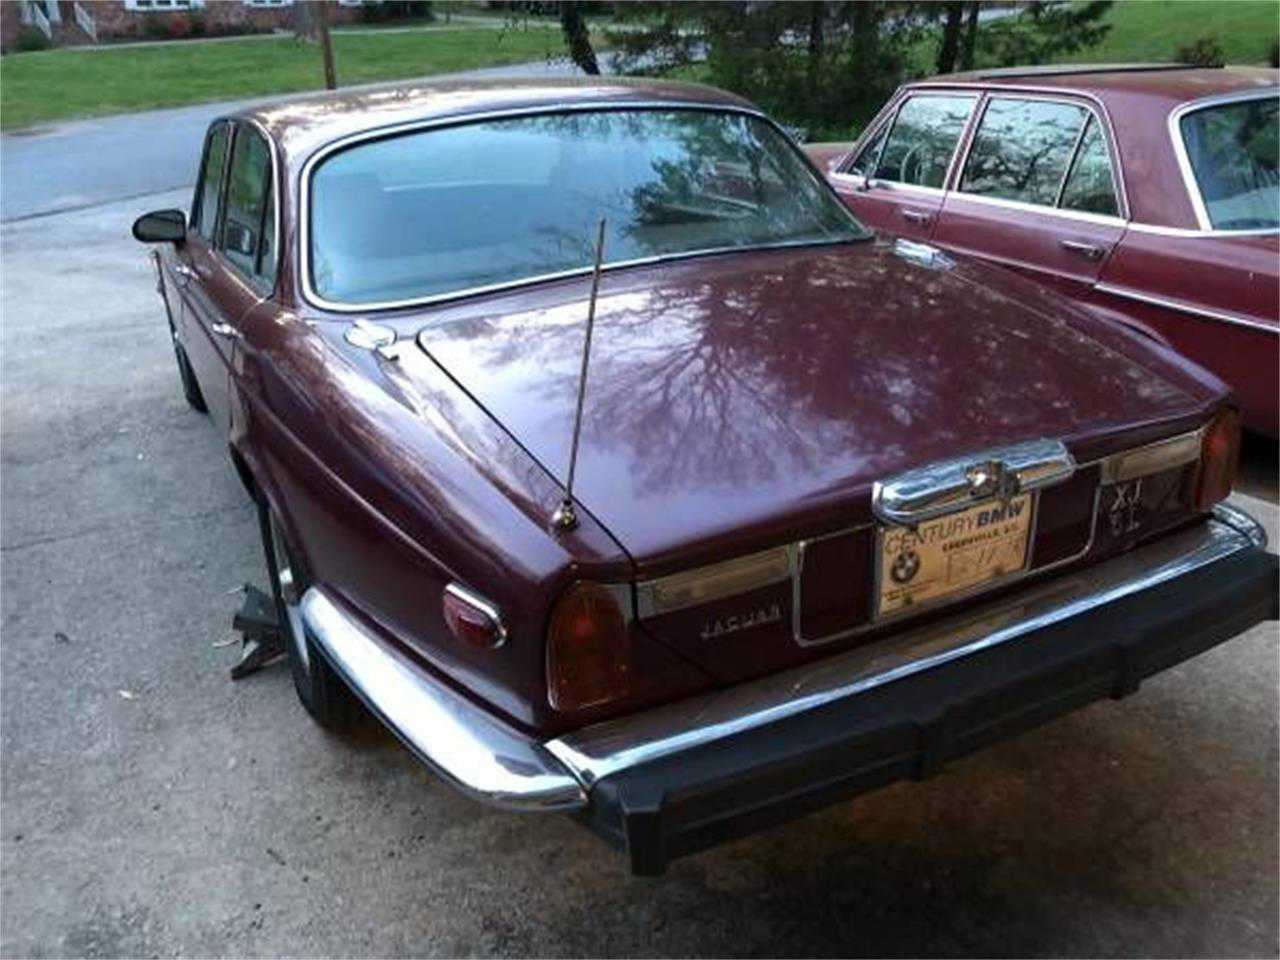 1977 Jaguar XJ6 for sale in Cadillac, MI   AAH13605